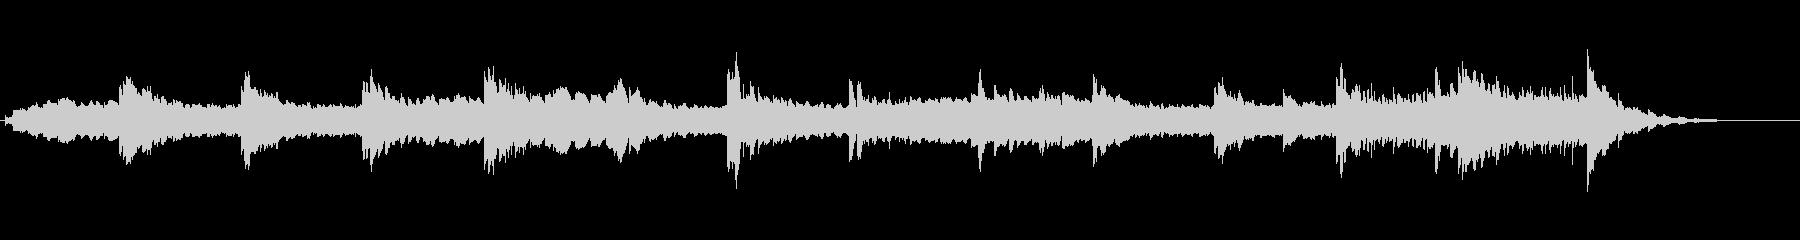 d 1分企業PV向け静謐で神秘的な曲の未再生の波形